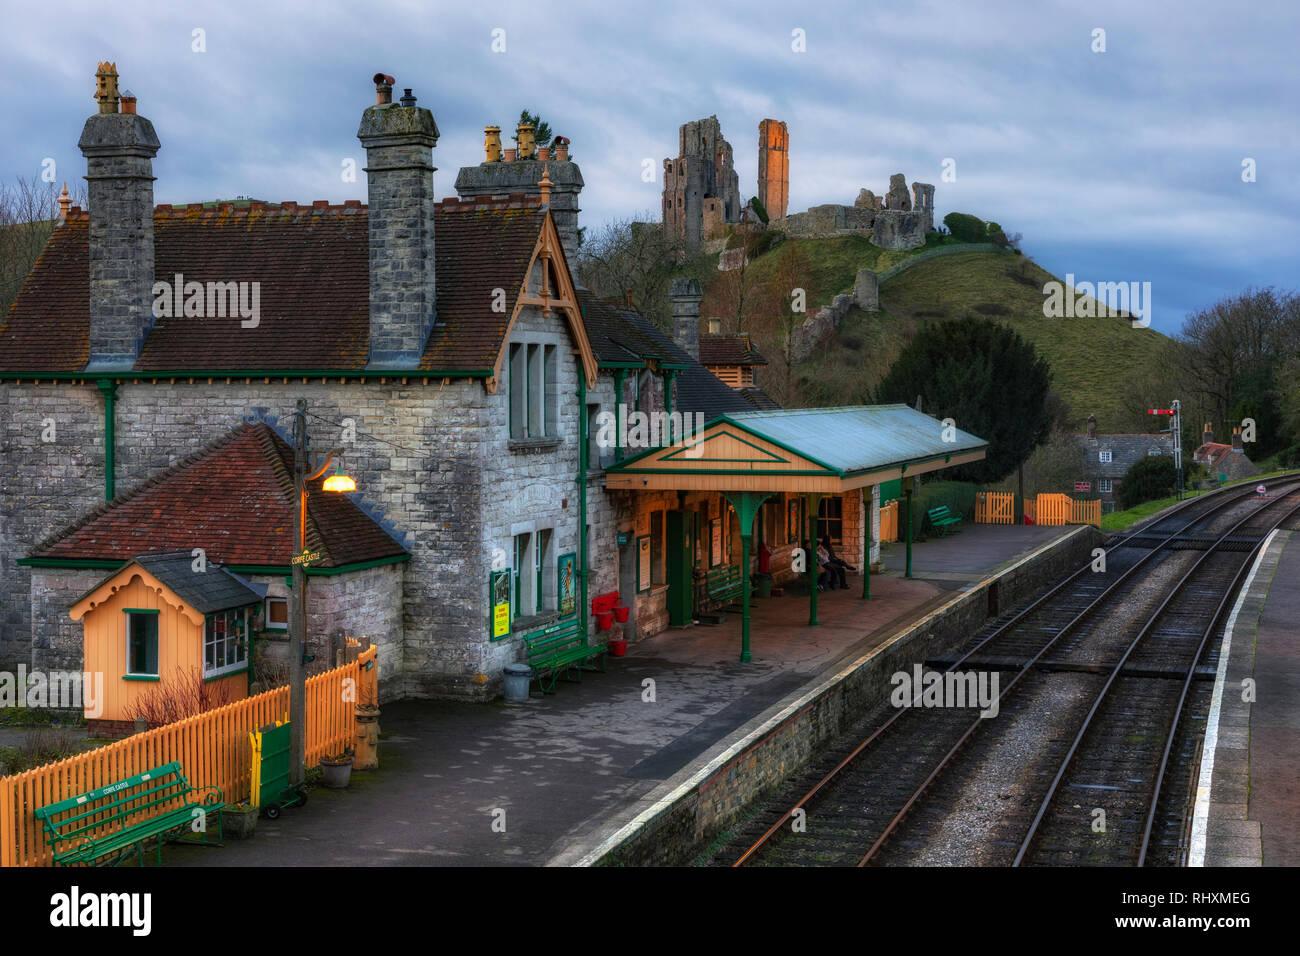 El castillo Corfe, un tren de vapor, Dorset, Inglaterra, Reino Unido Foto de stock